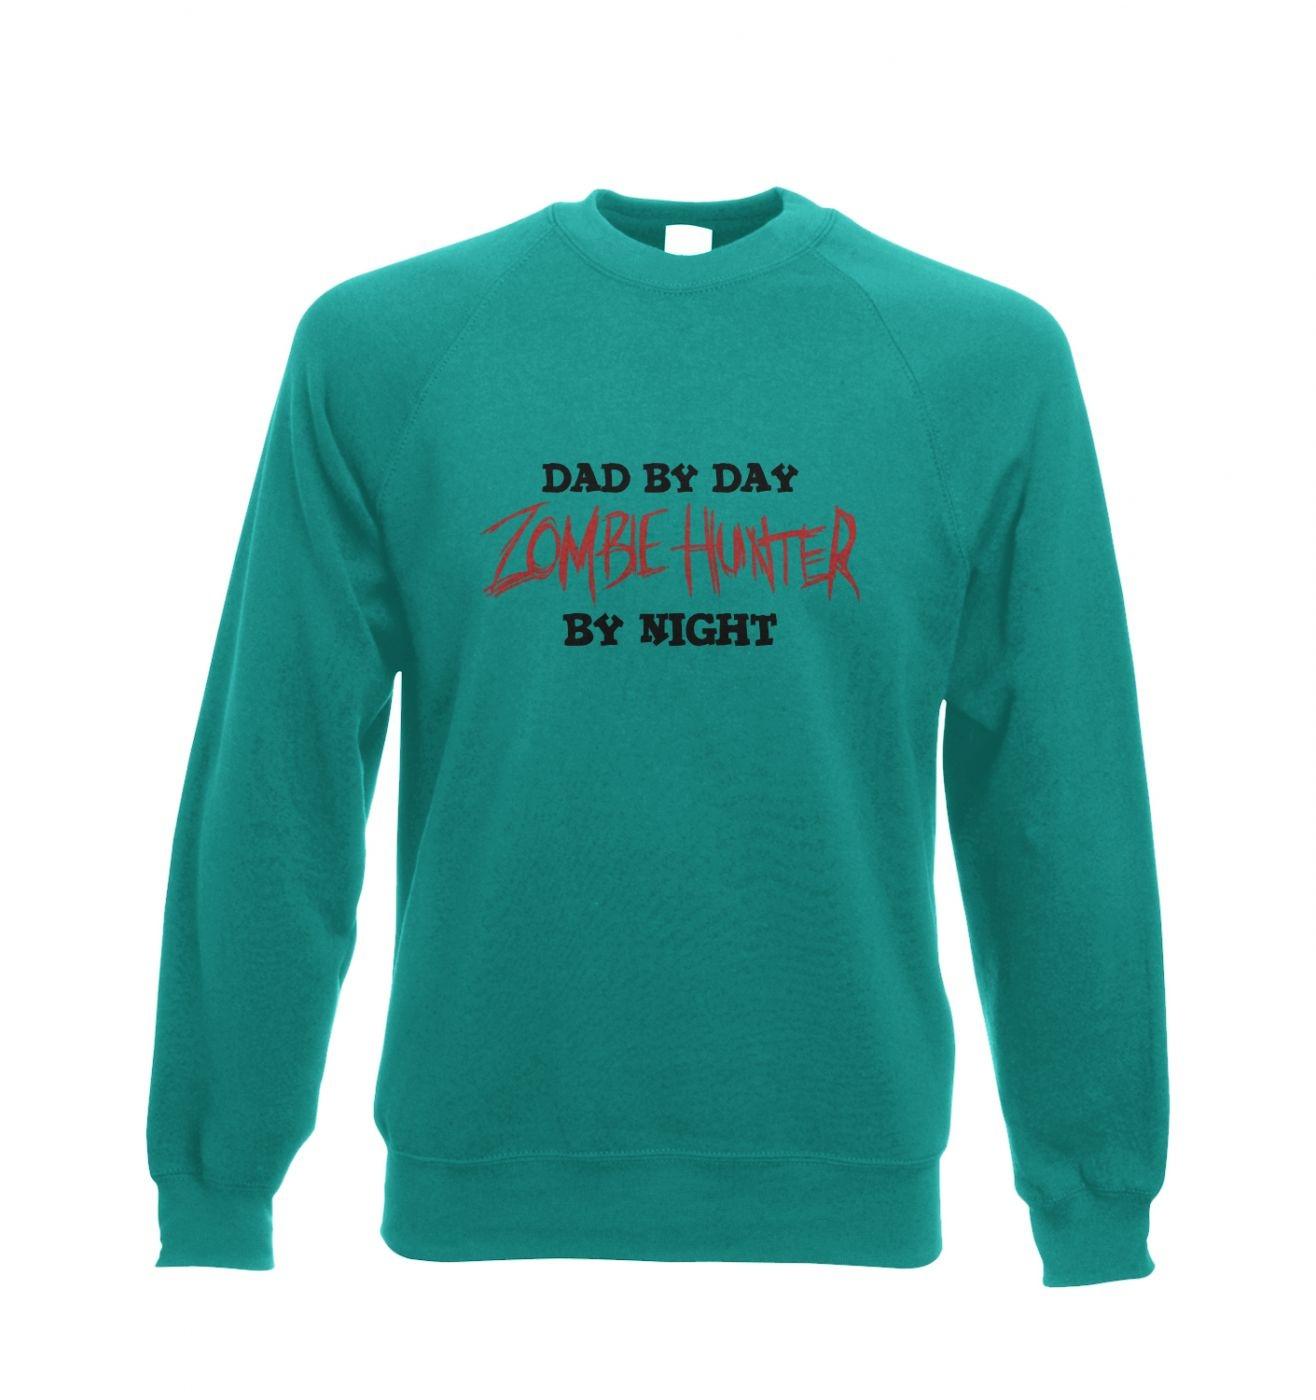 Dad By Day Zombie Hunter By Night crewneck sweatshirt